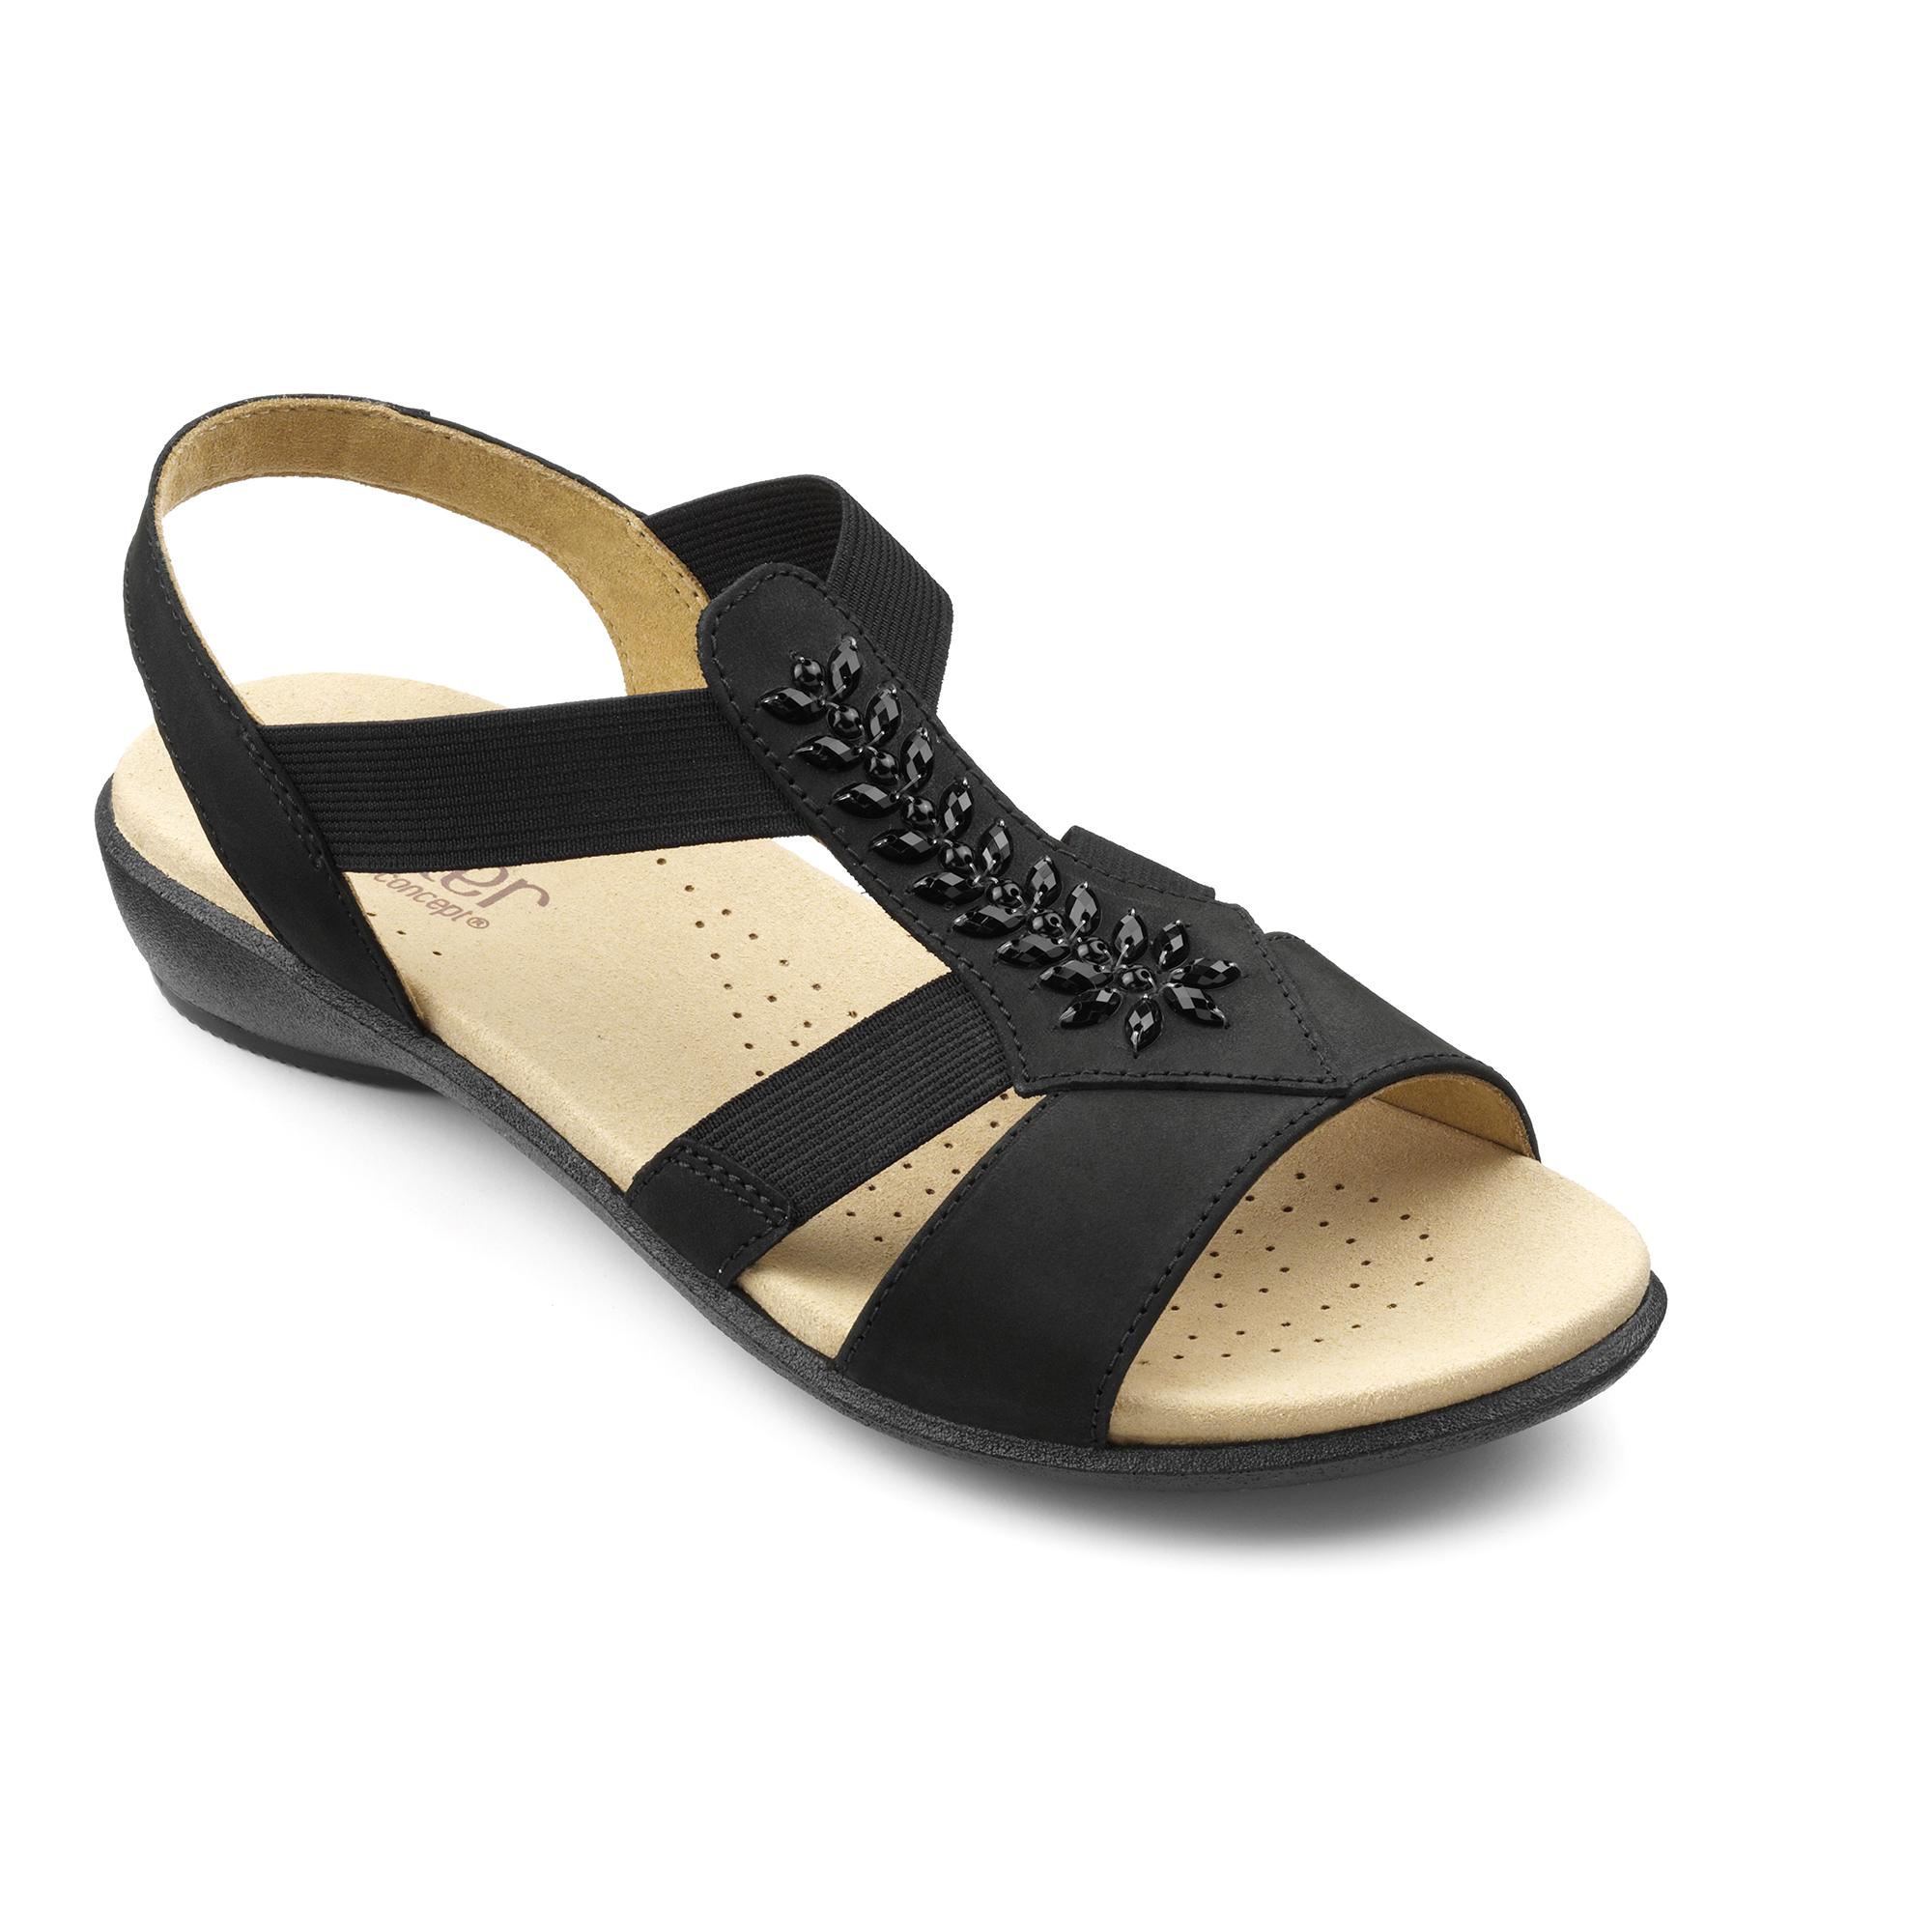 Hotter-Mujer-Beam-Senoras-Tacon-Bajo-Sandalias-Verano-Casual-Calzado